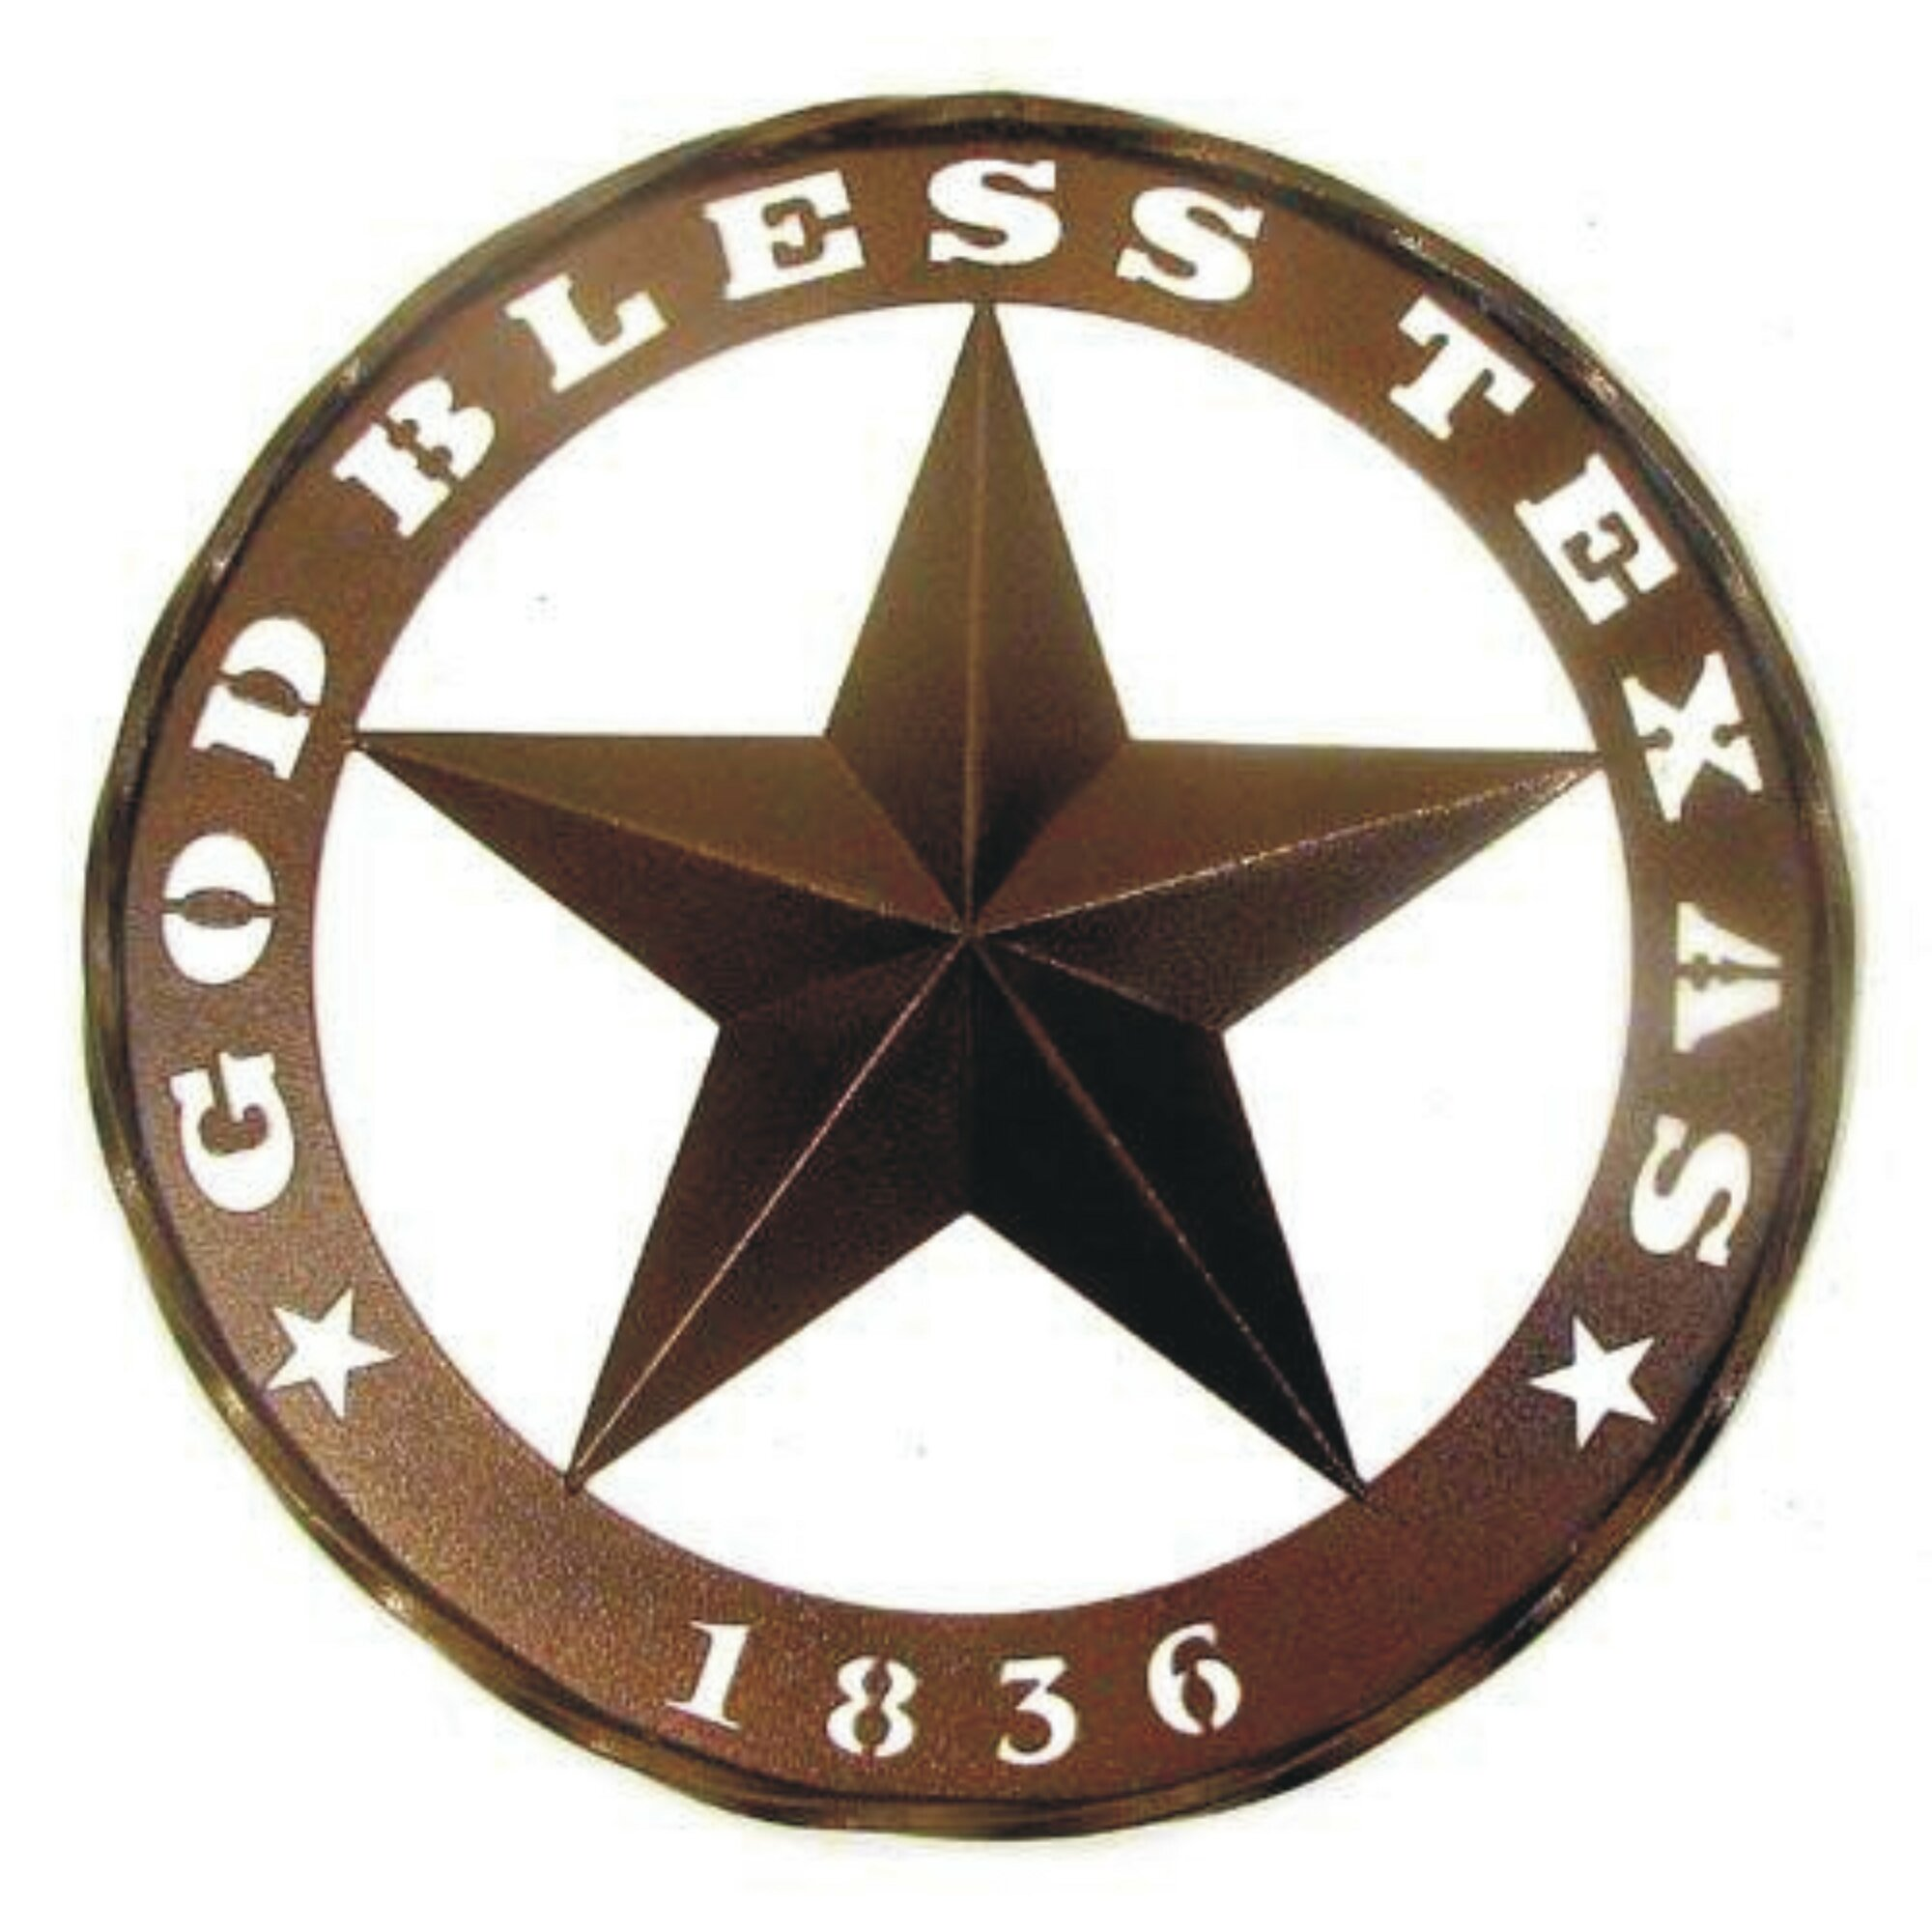 god bless texas and 1836 star wall dcor - Star Wall Decor